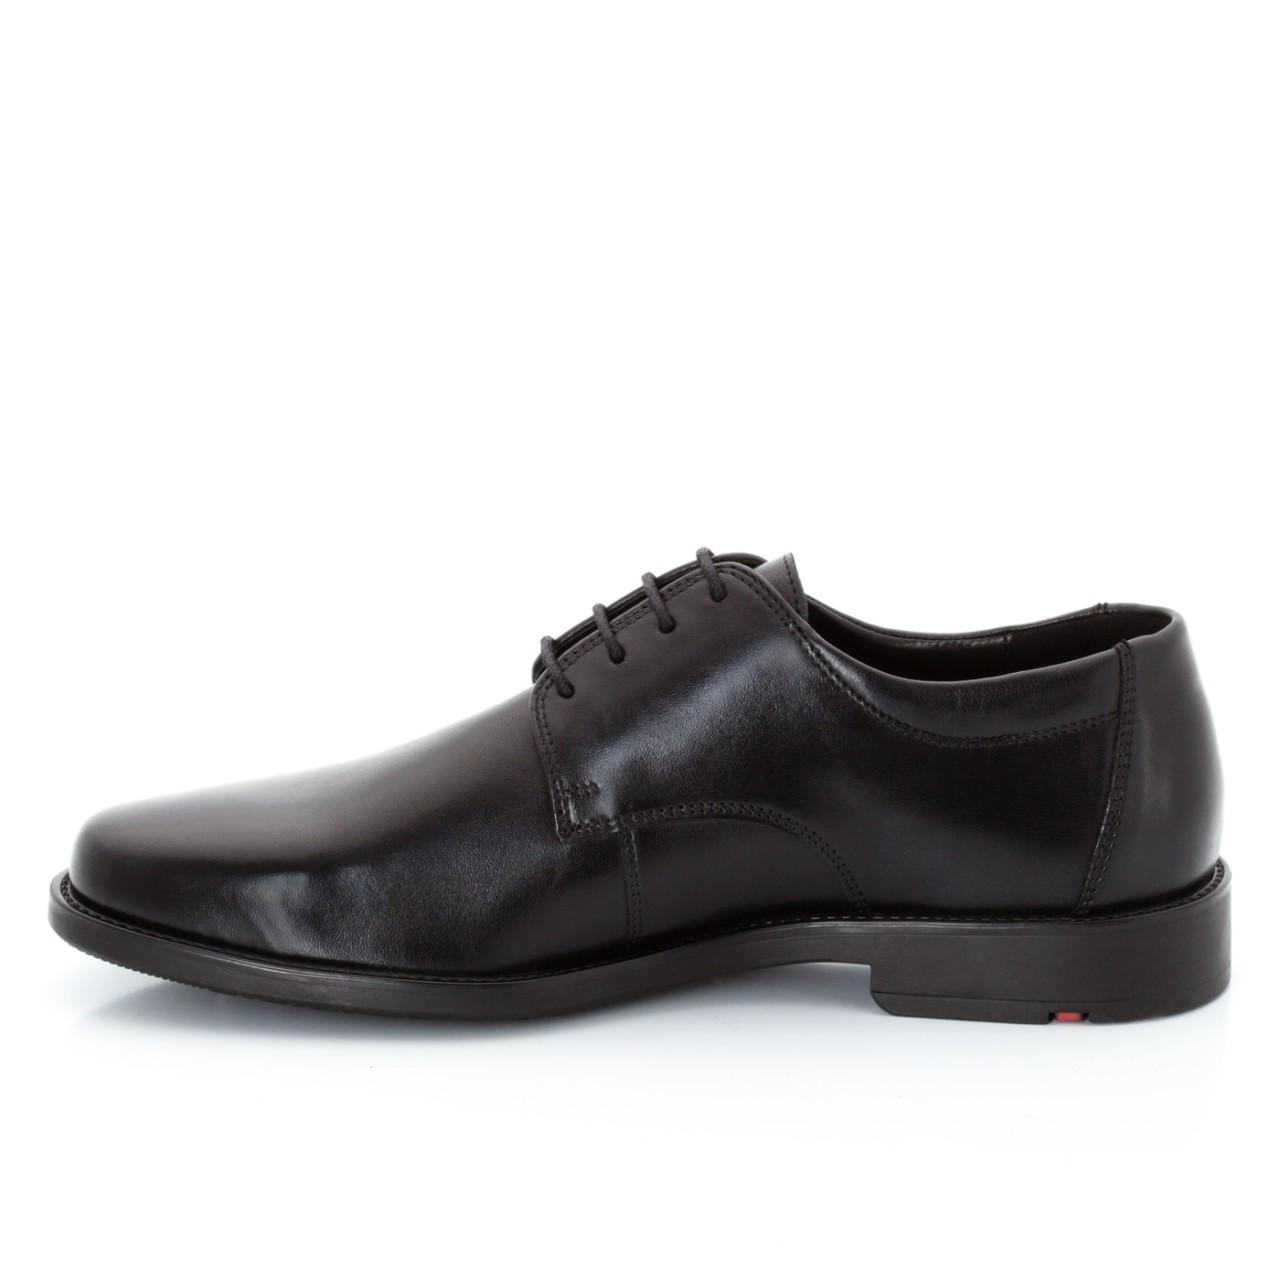 Nevio Business schwarz Lloyd schwarz Schuhe schwarz Business Lloyd Schuhe P0w5qn